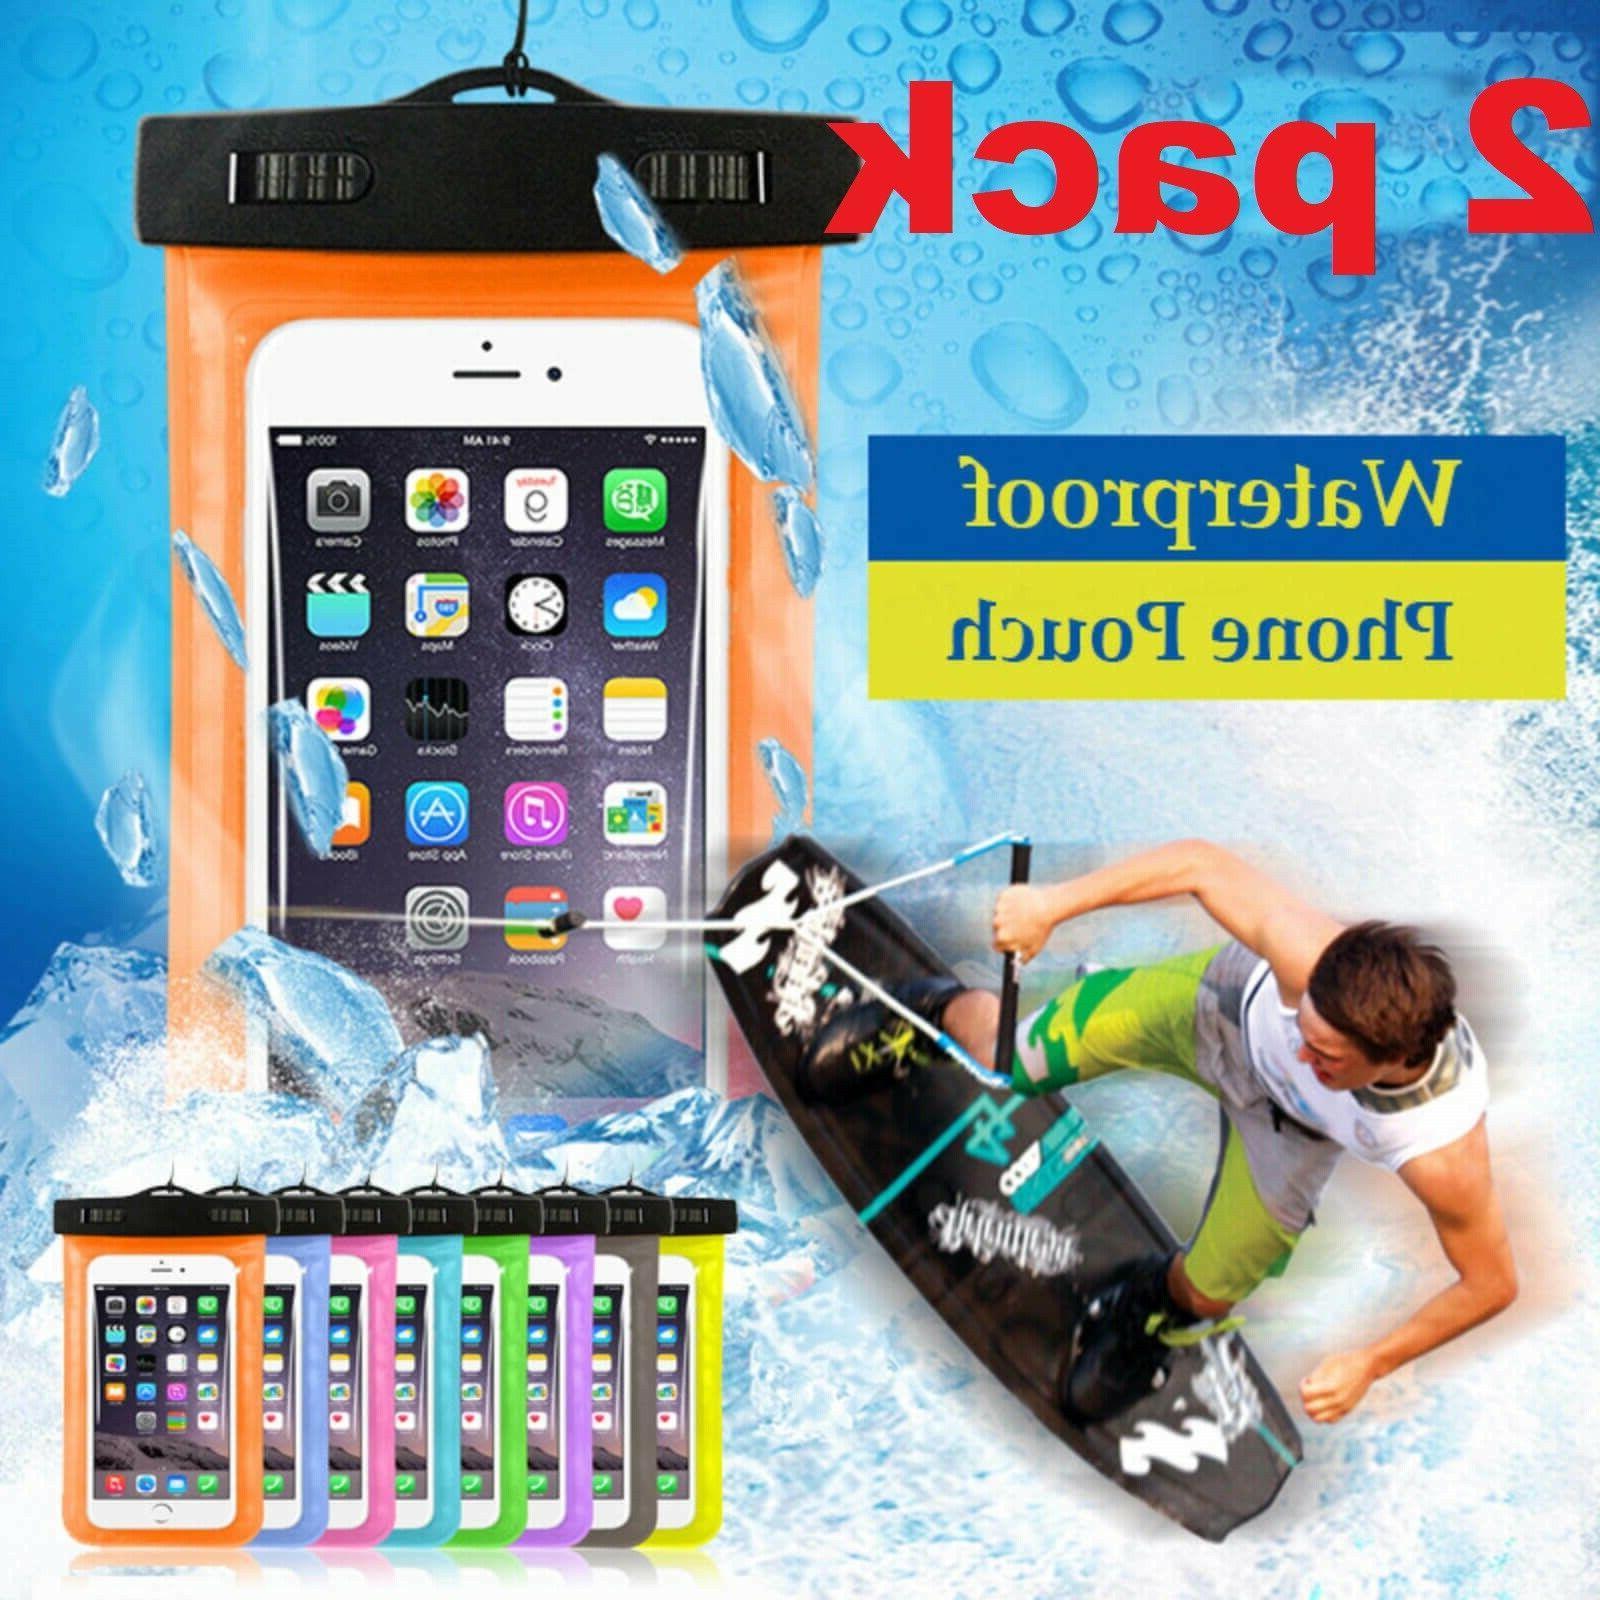 2 pack swimming waterproof underwater pouch bag